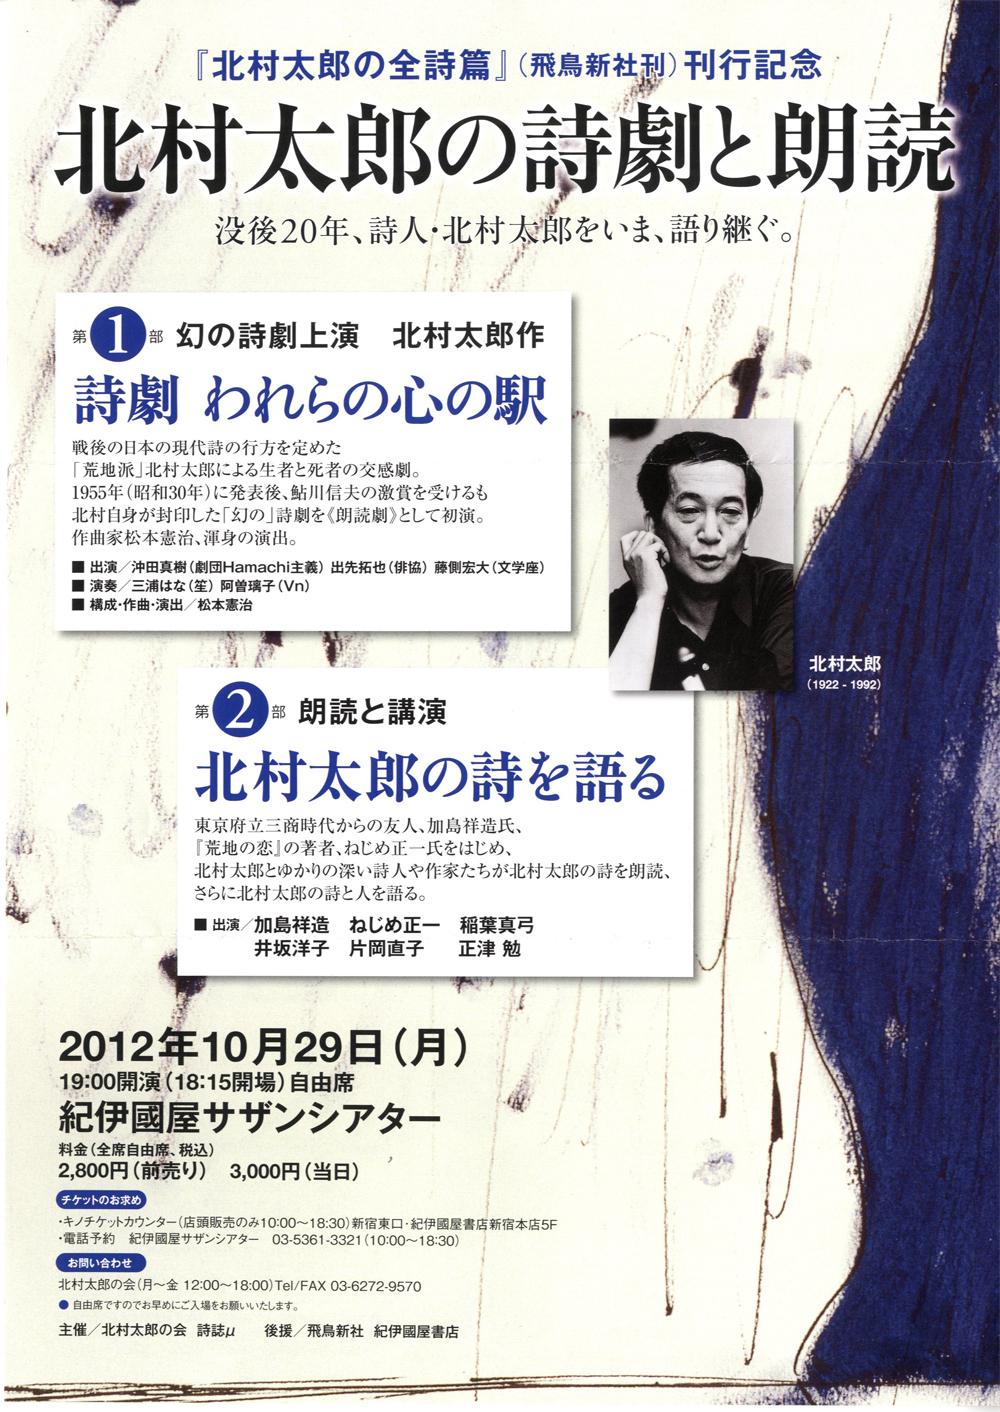 No.002 『北村太郎の詩劇と朗読』開催